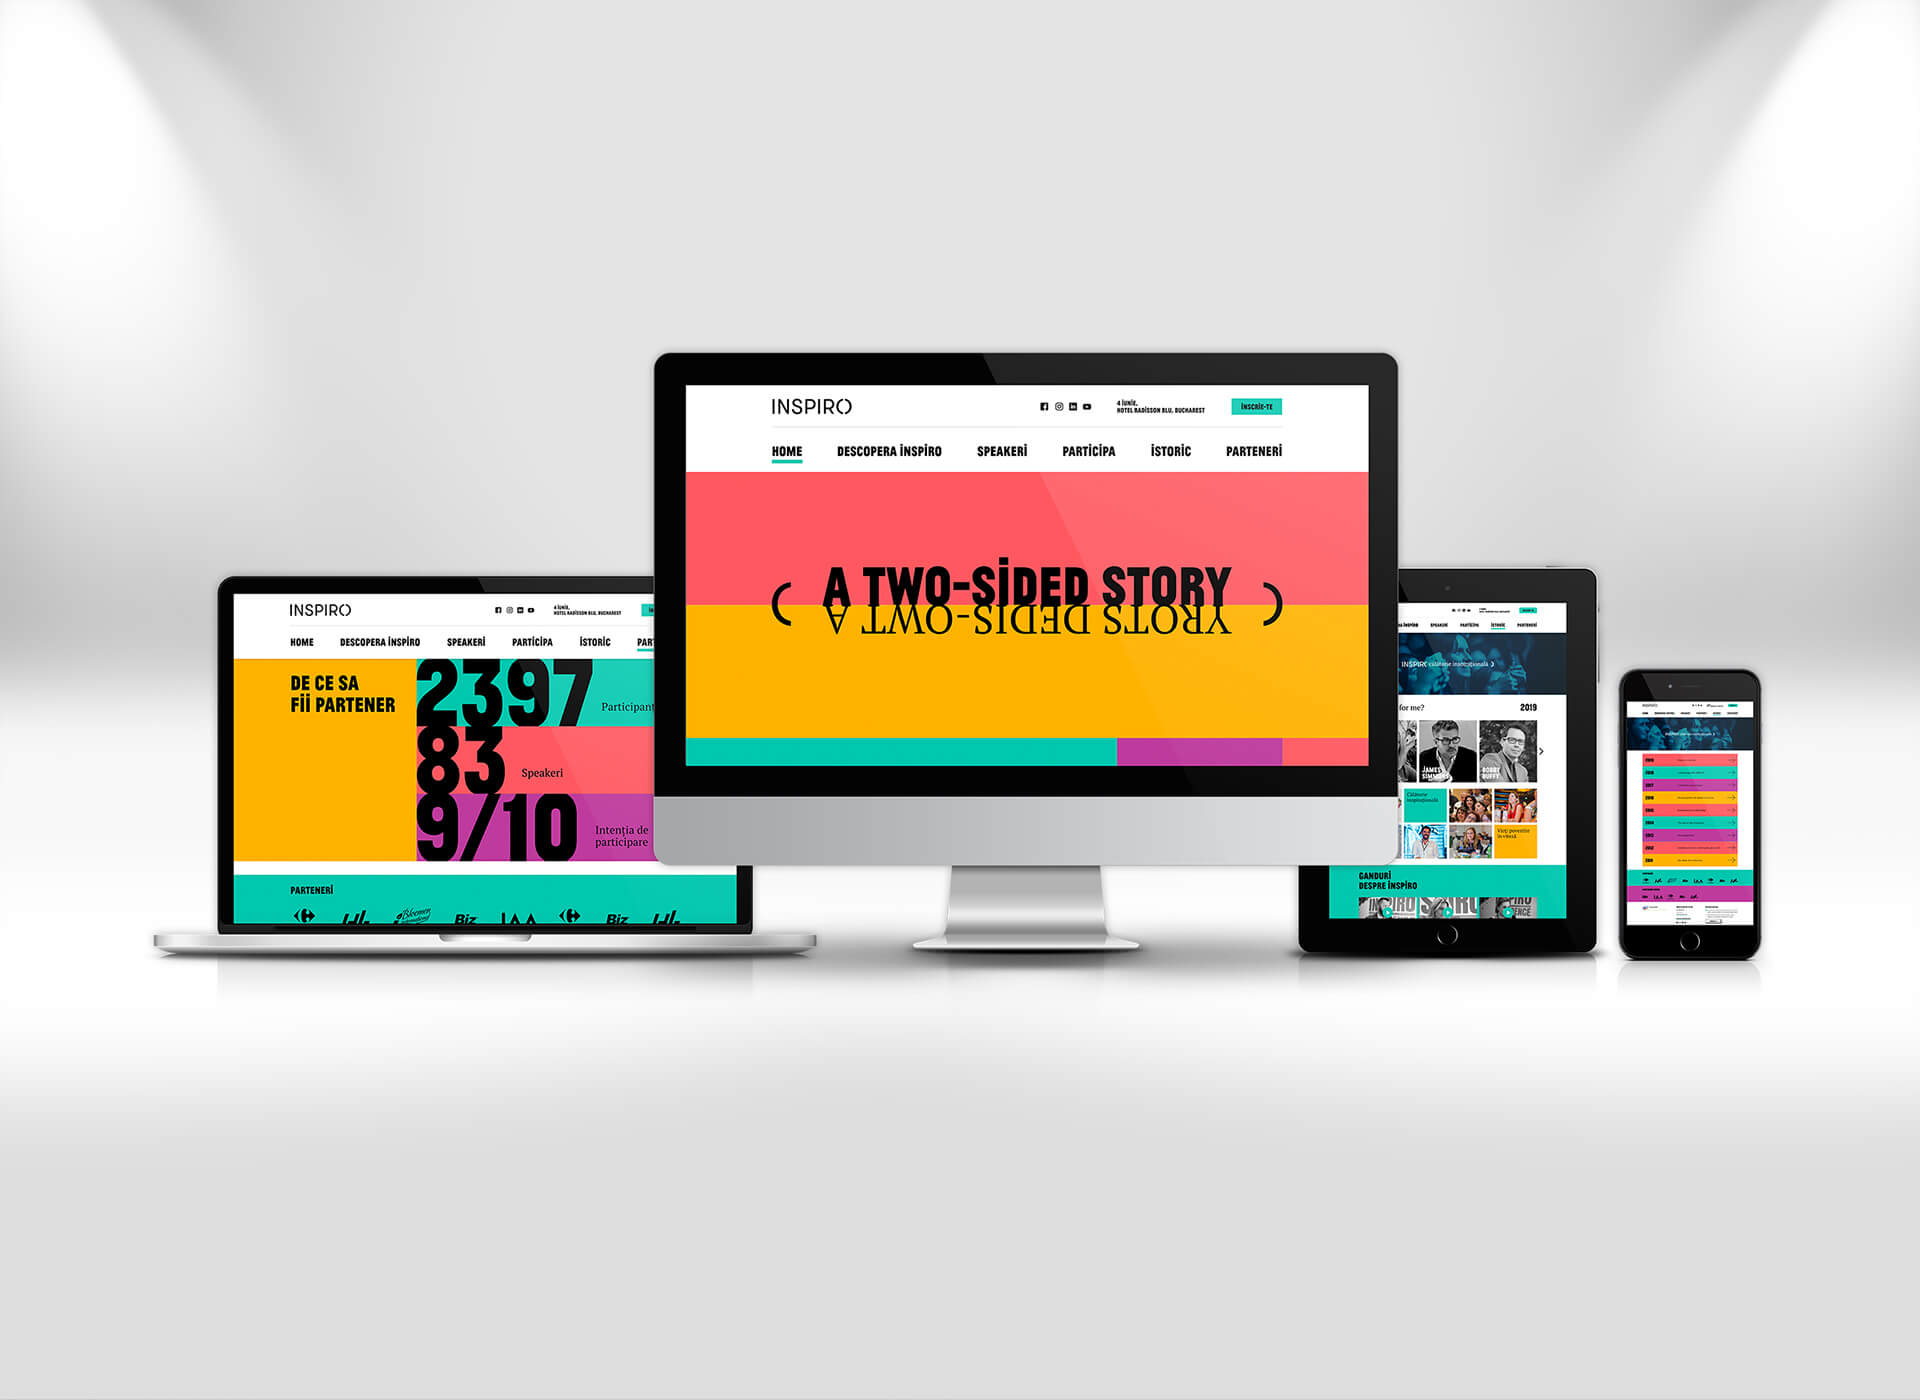 Inspiro portofoliu inoveo website